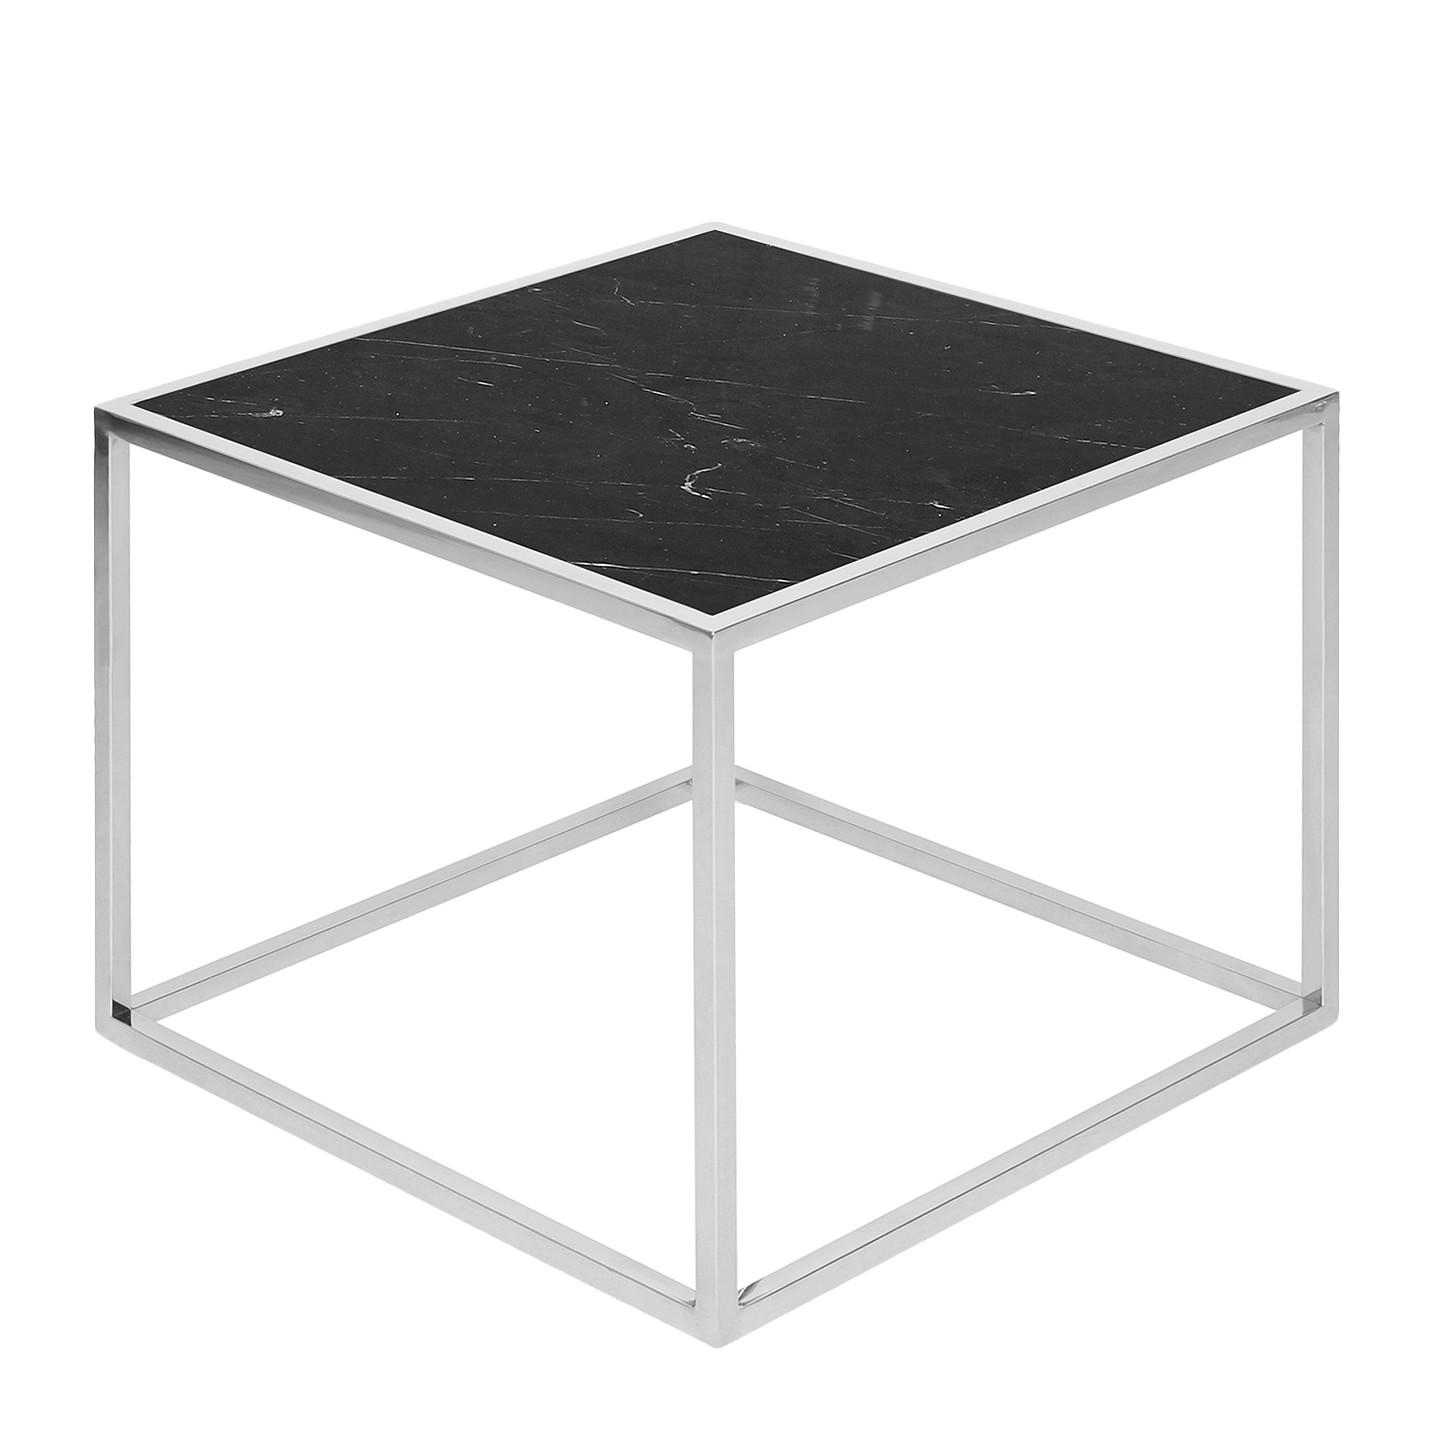 Beistelltisch Jacob - Marmor / Edelstahl - Schwarz / Silber, Studio Copenhagen